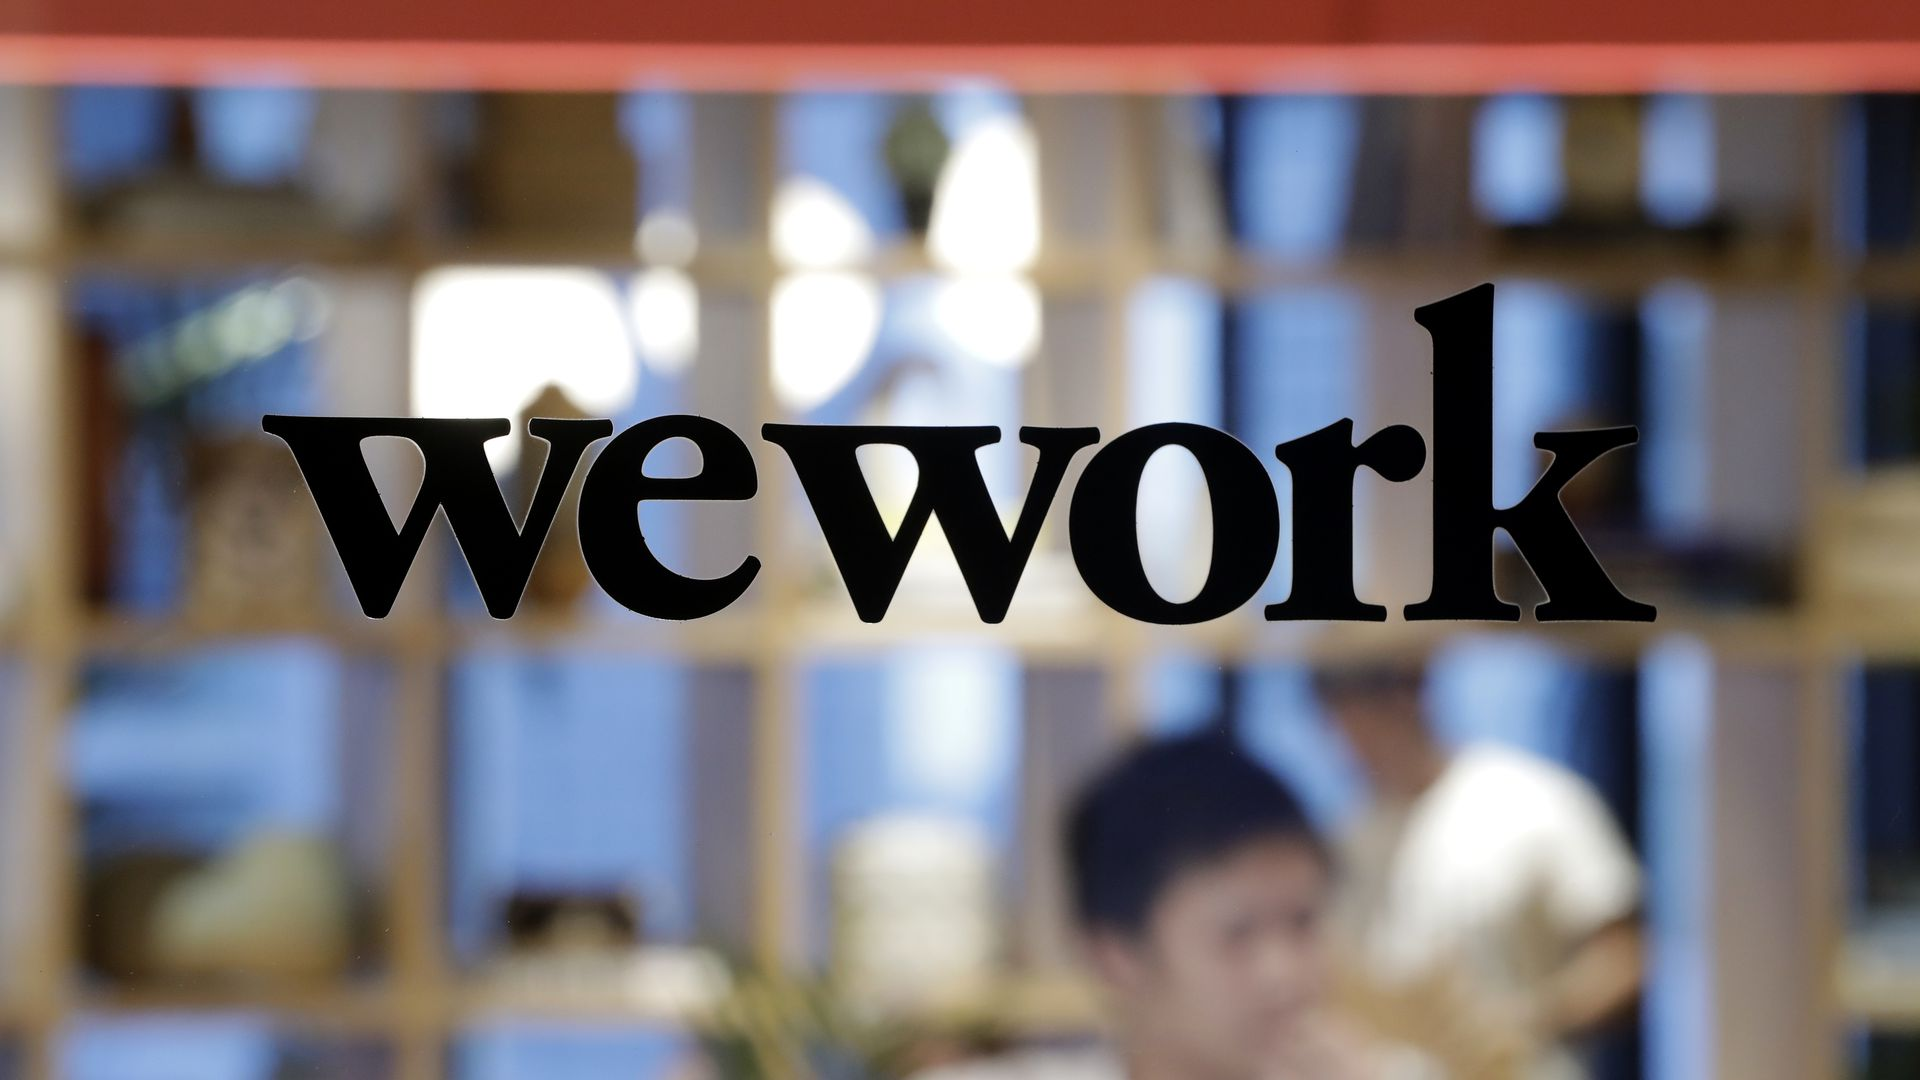 The WeWork logo